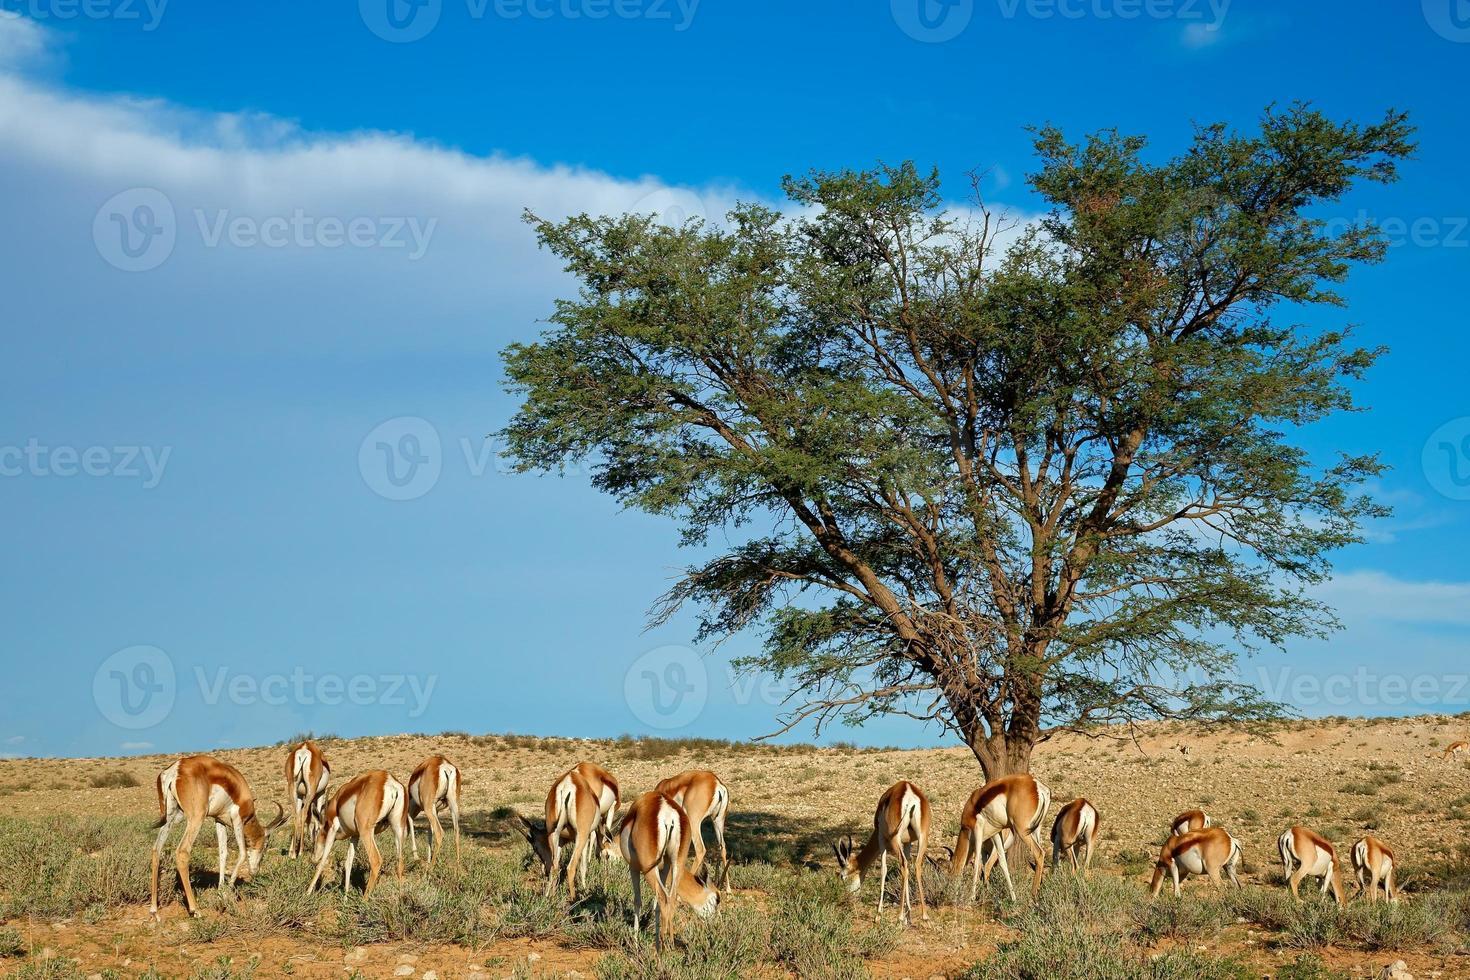 paisaje de antílopes springbok foto